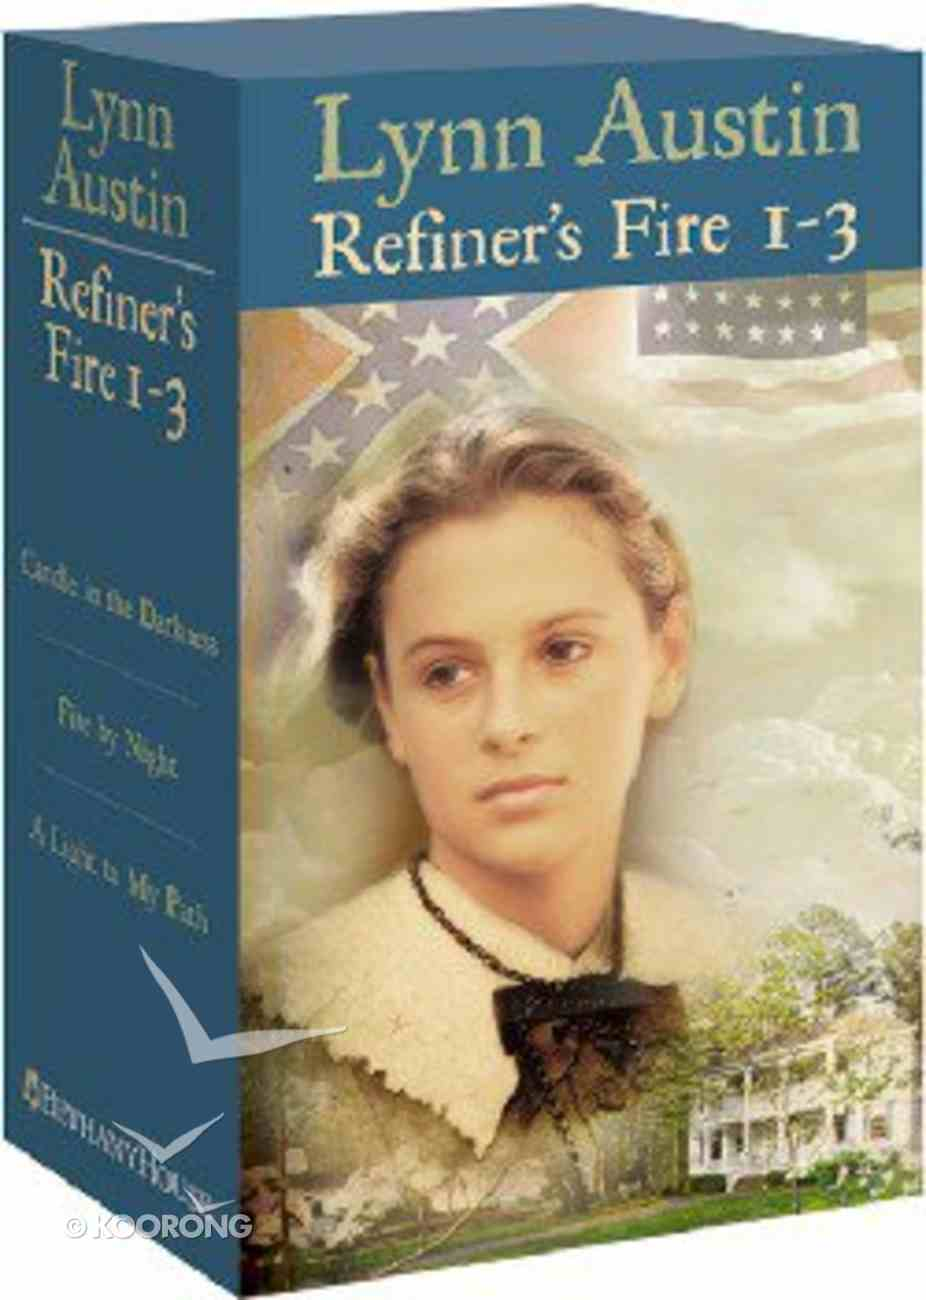 Refiner's Fire 1-3 (3 Volume Set) (Refiner's Fire Series) Pack